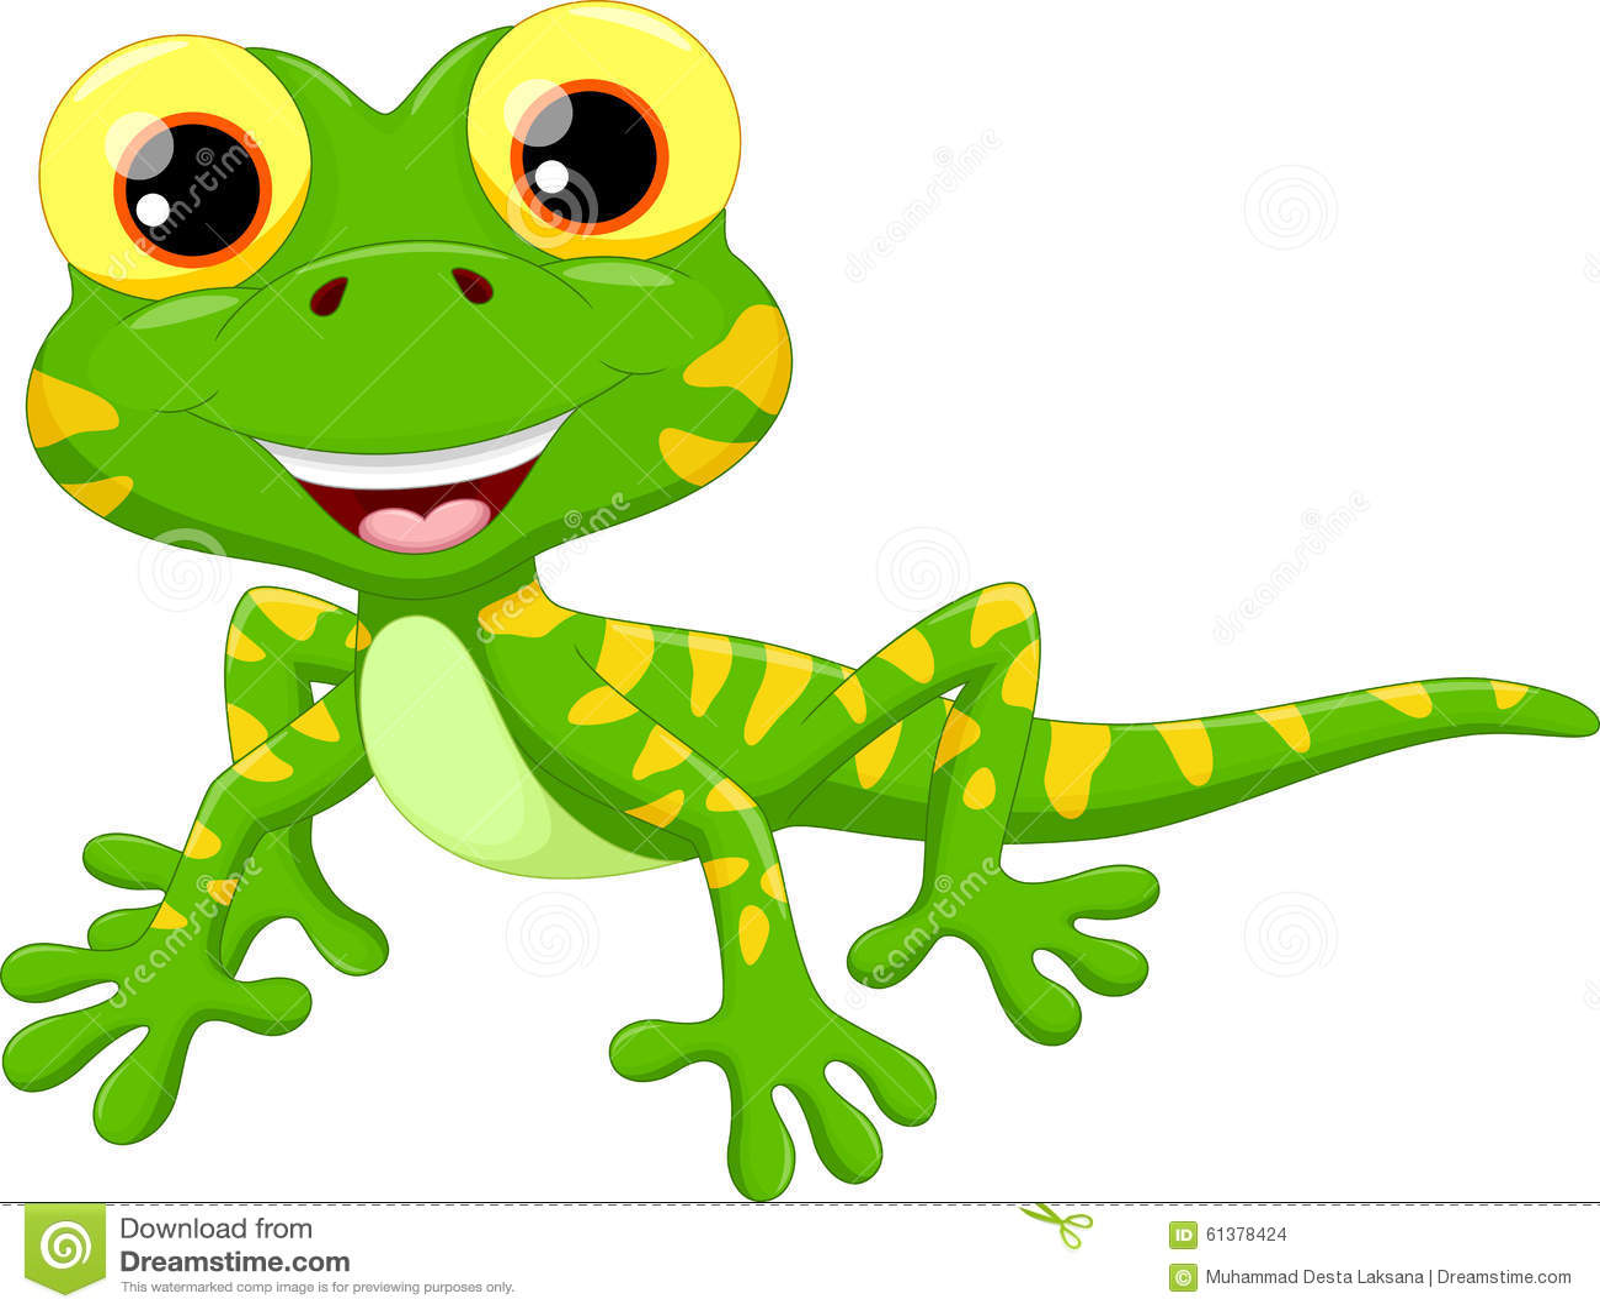 cute lizard cartoon stock illustration image 61378424 Thanksgiving Border Clip Art Thanksgiving Border Clip Art